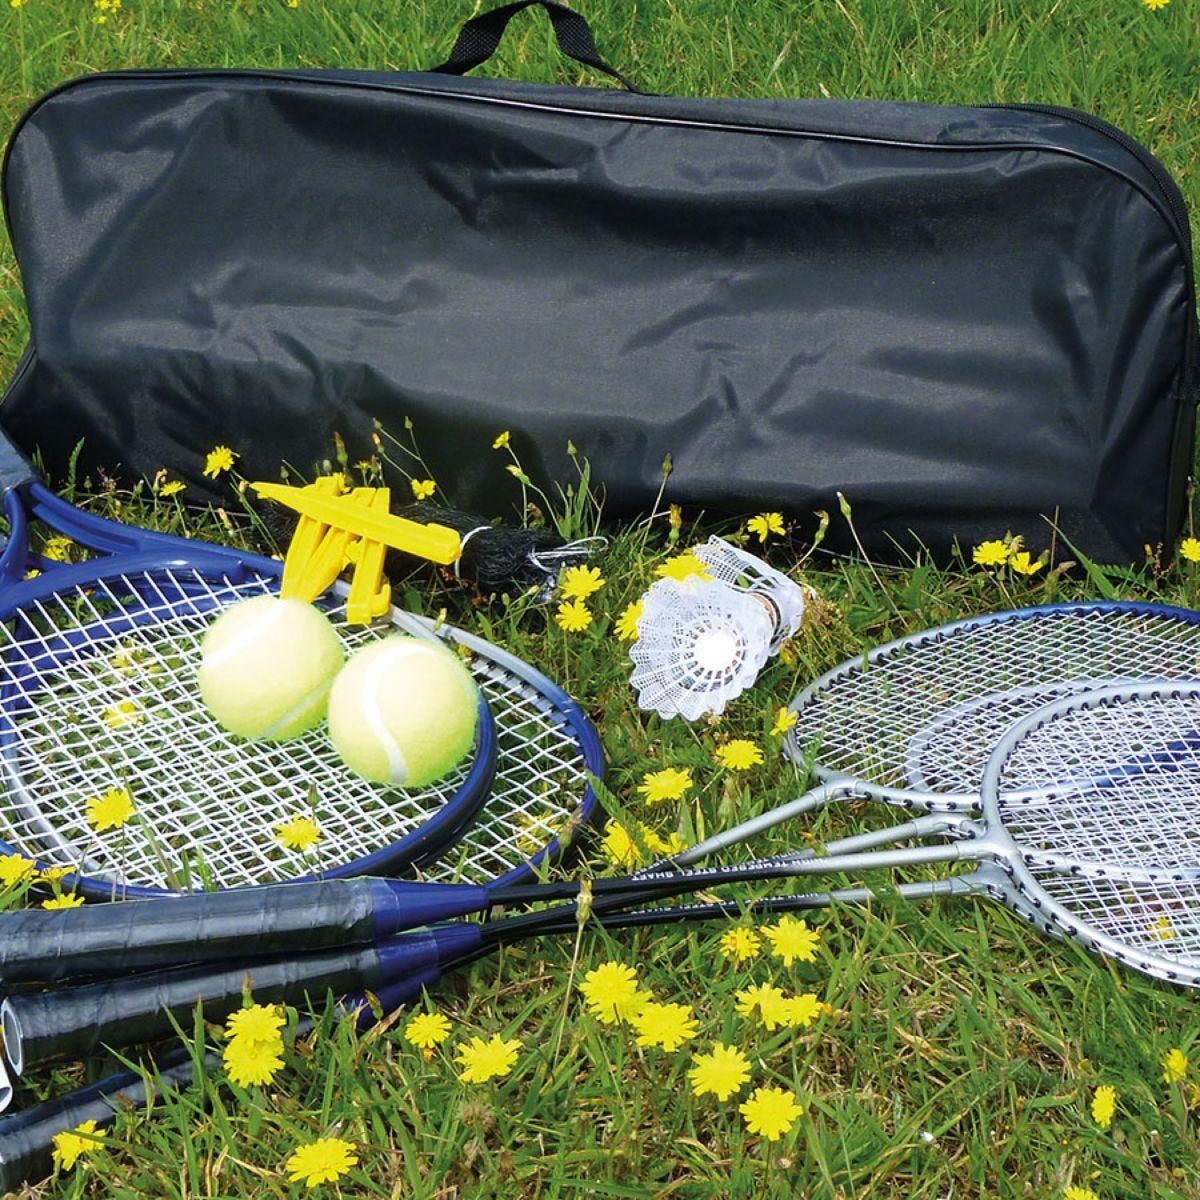 Mightymast Badminton and Tennis Combo Set